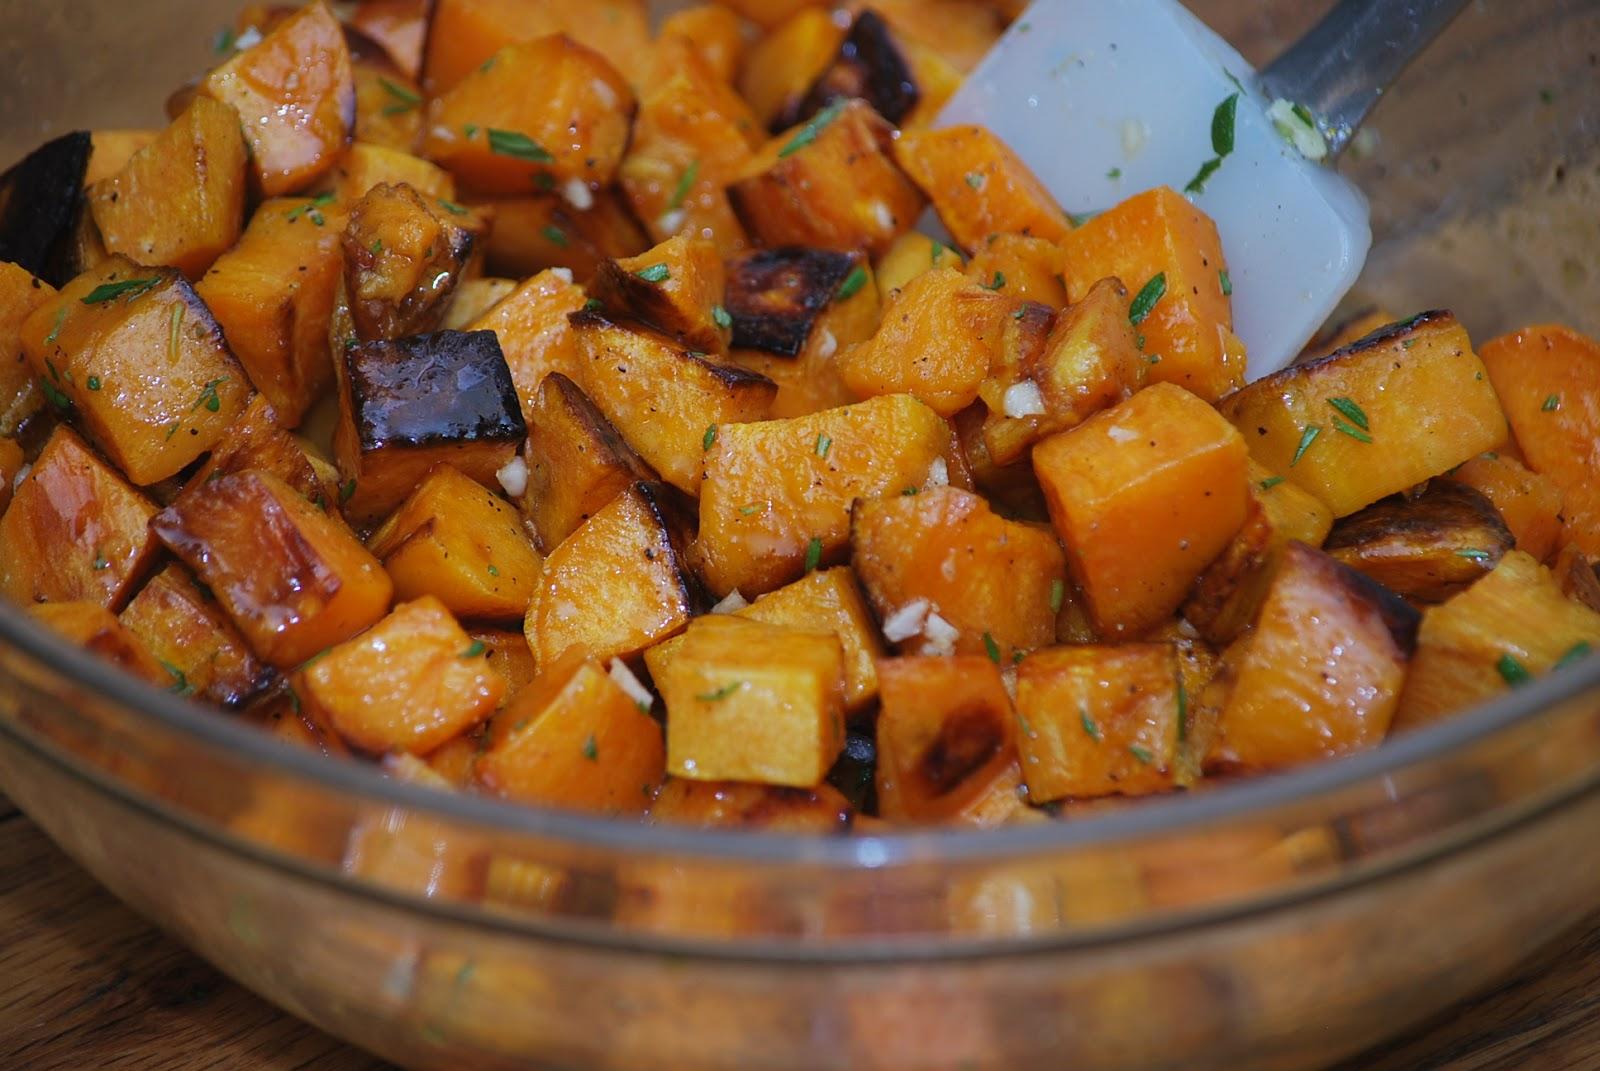 My story in recipes: Roasted Sweet Potato Salad